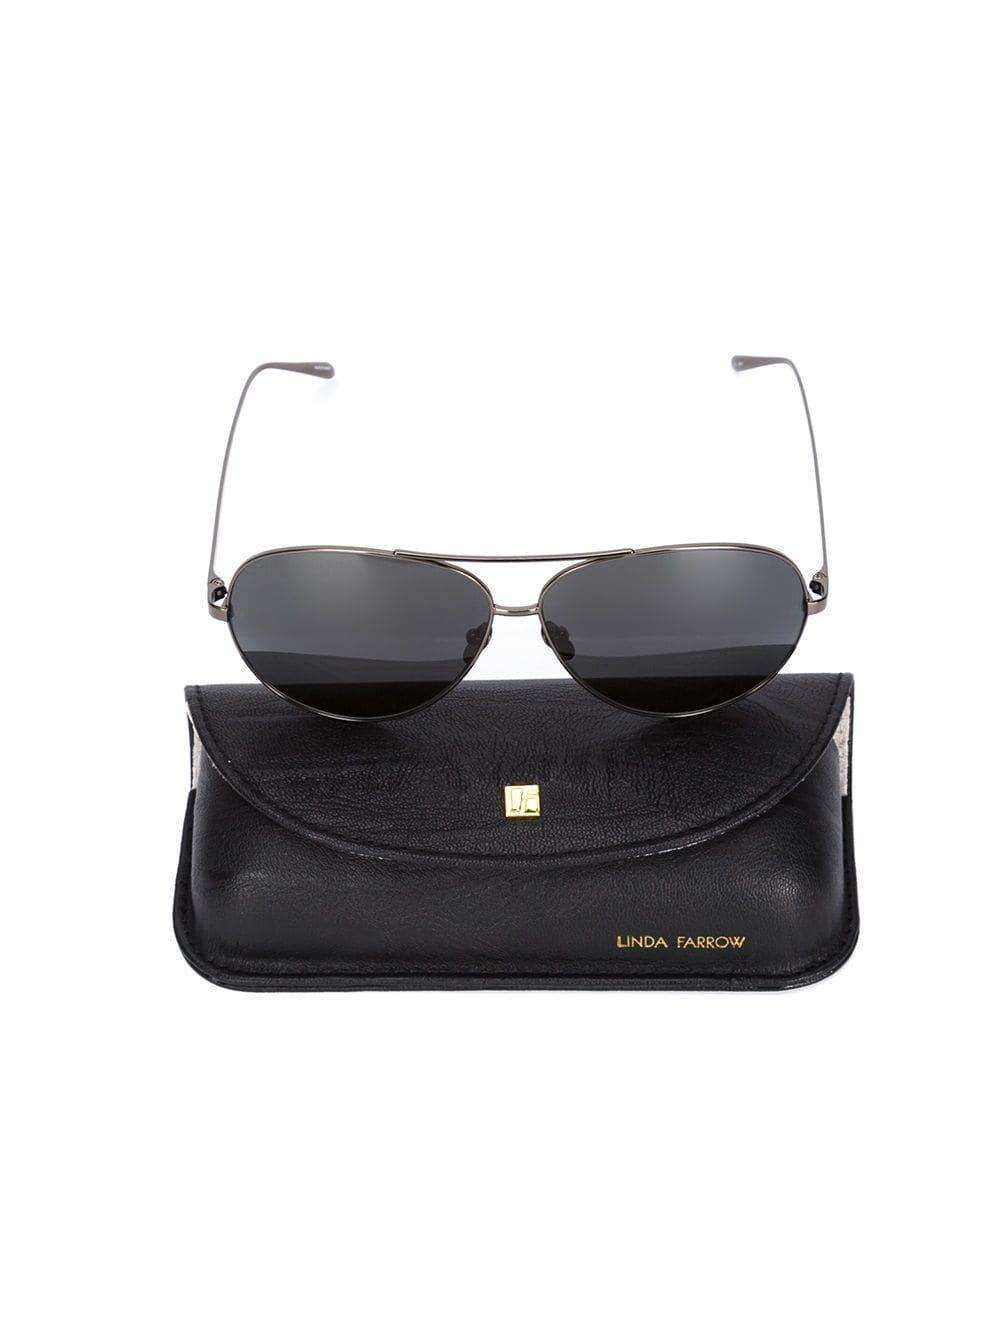 62f80d5b6935 Linda Farrow Aviator Sunglasses in Gray - Lyst